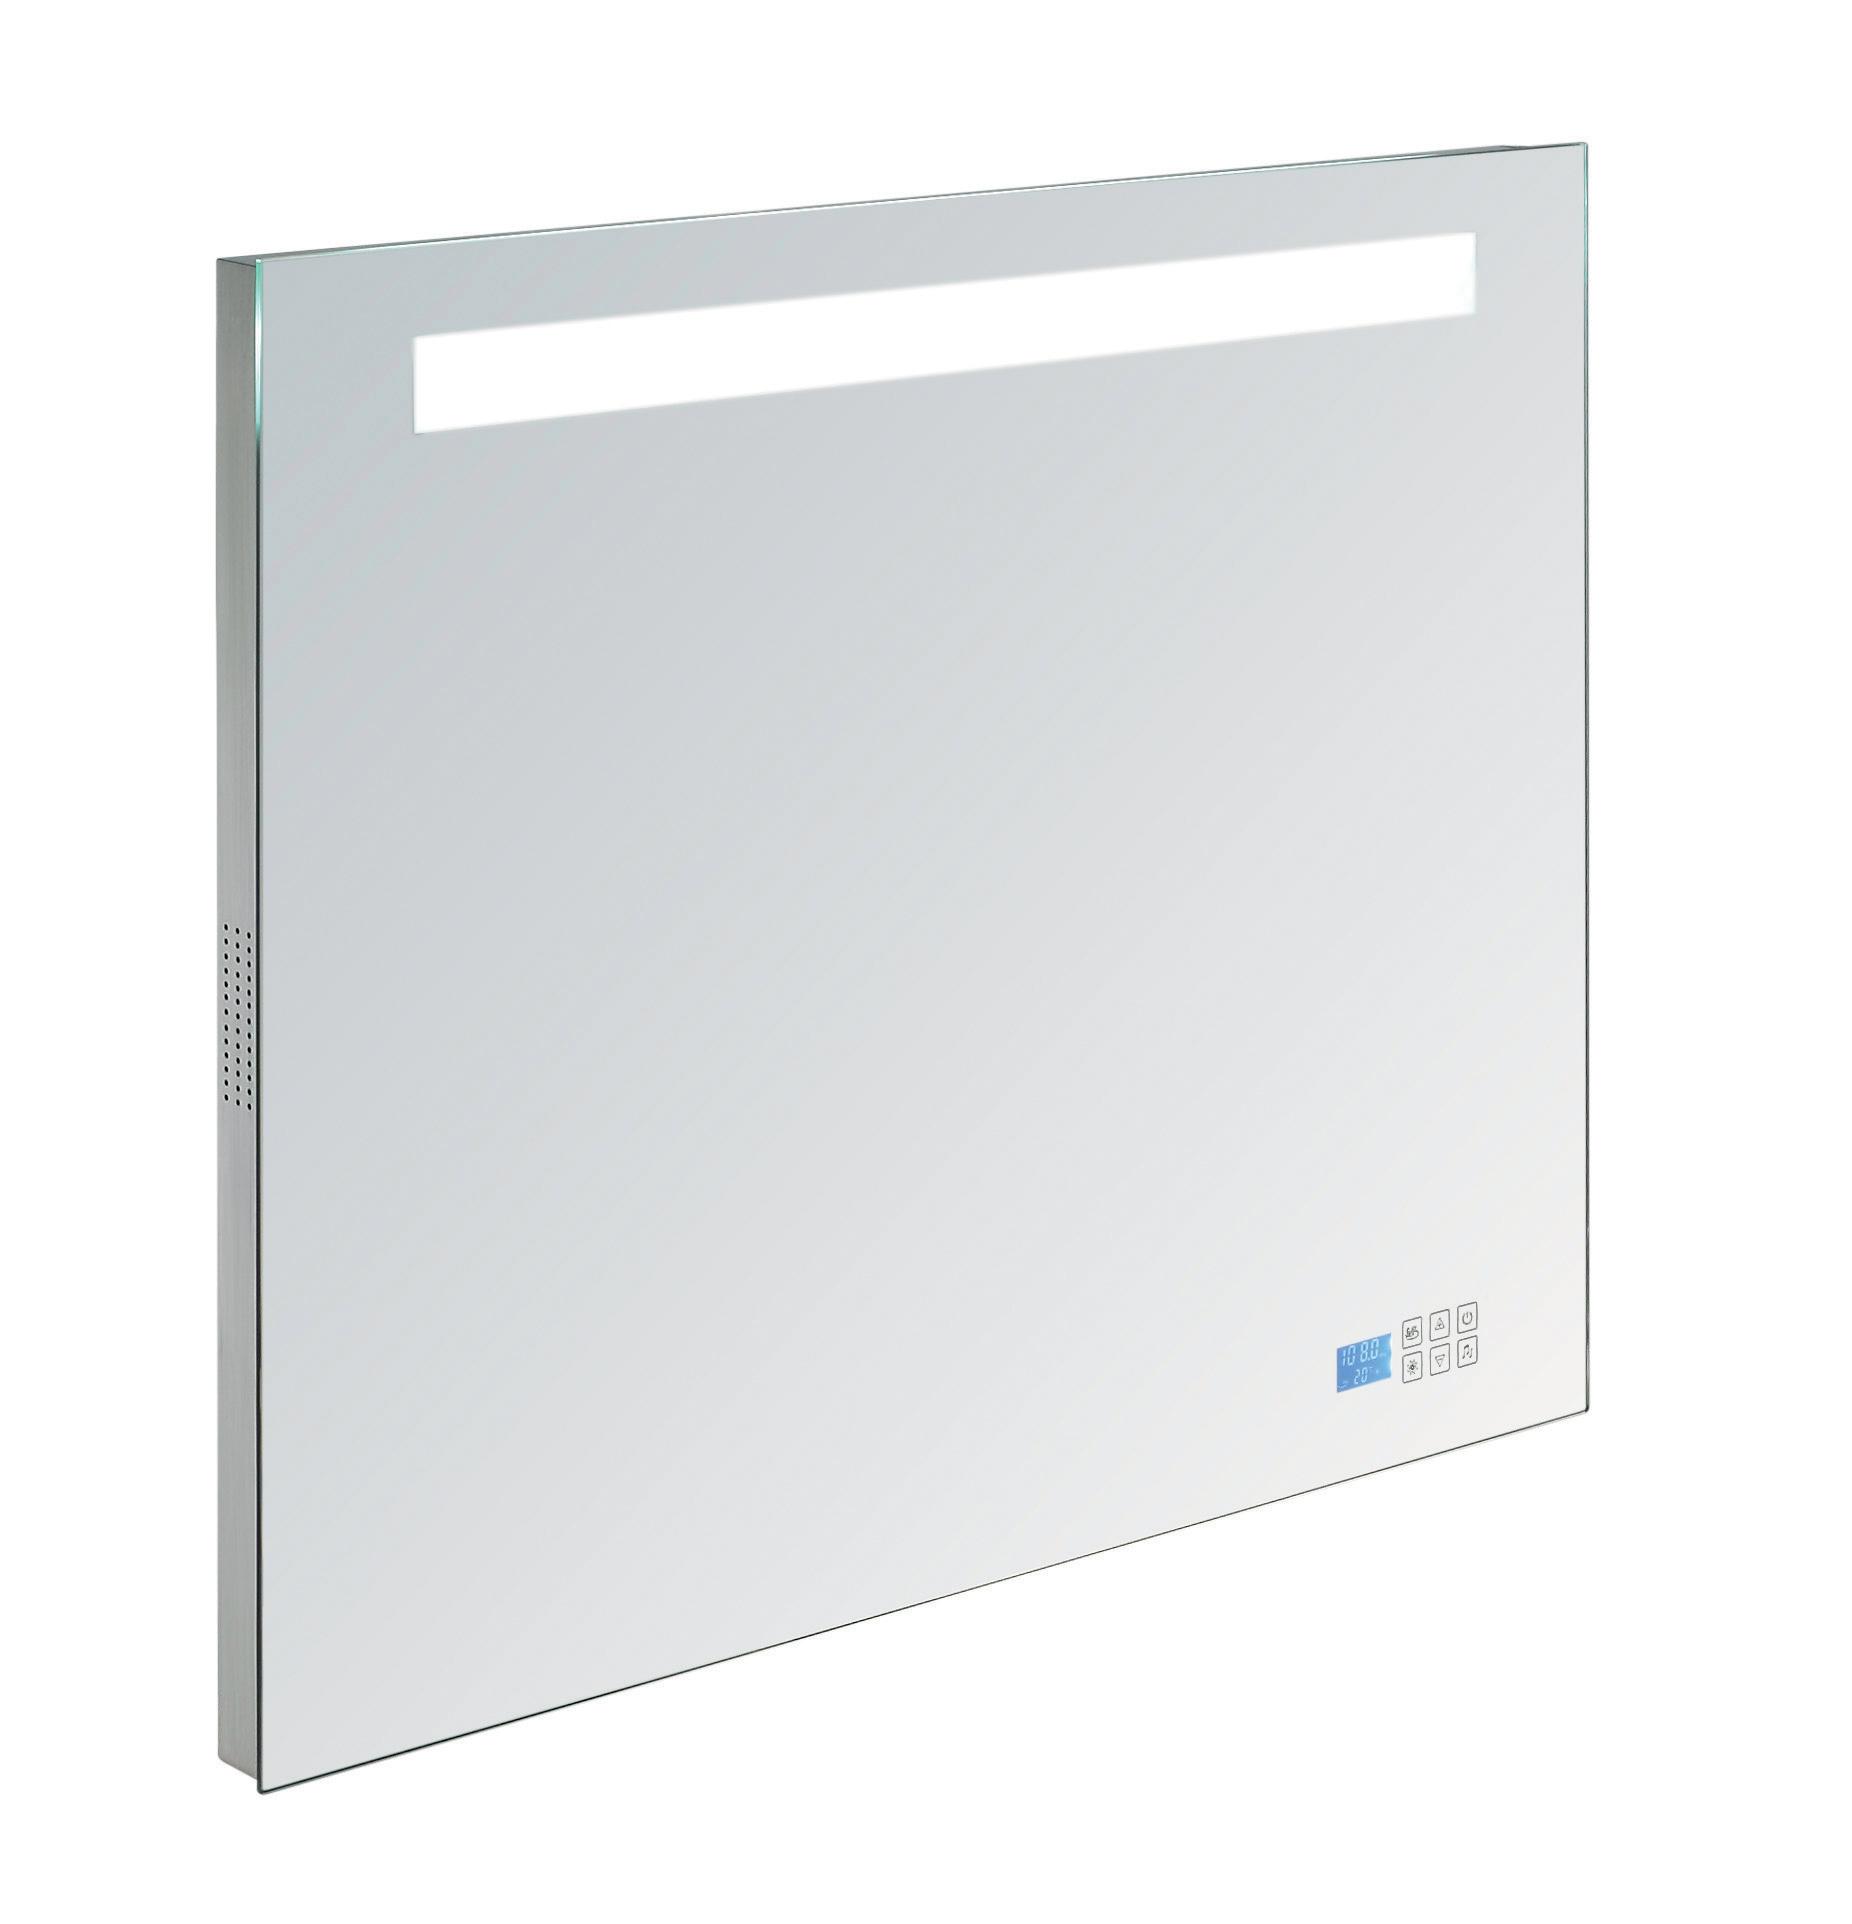 Badkamer spiegel met verlichting en Bluetooth radio - Douchecabine.nl